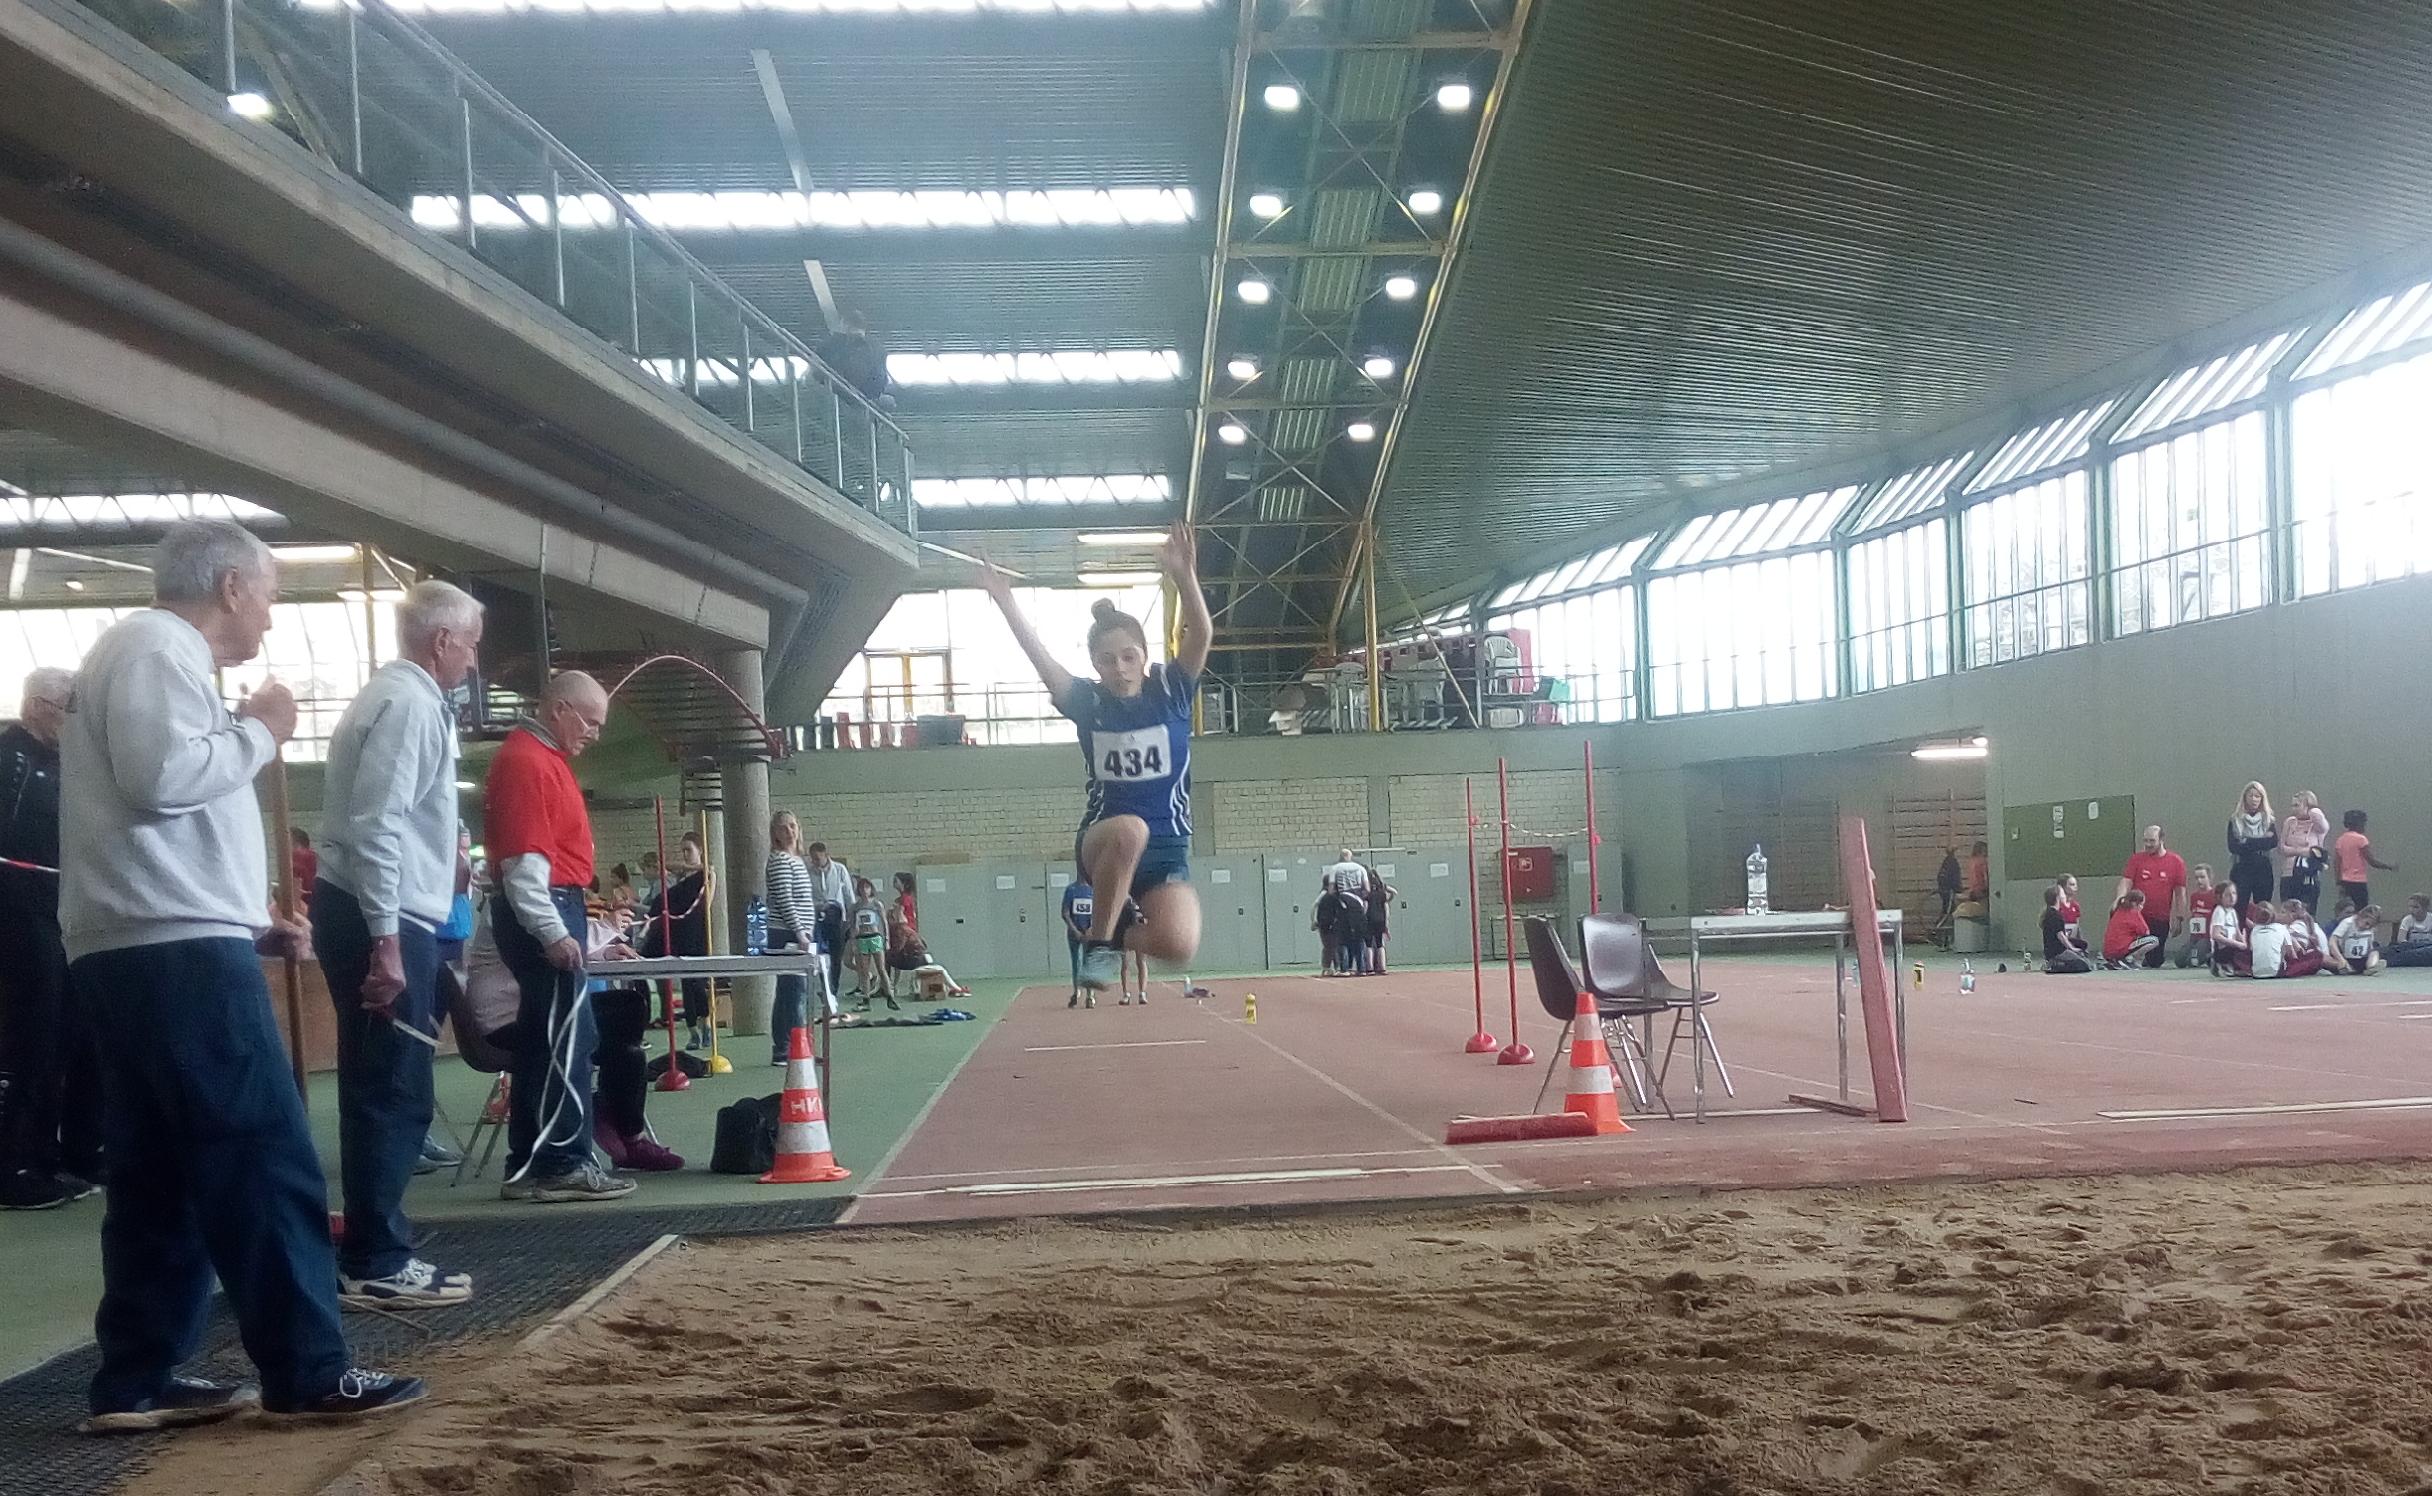 Indoormeeting Dortmund, 02/03/2019